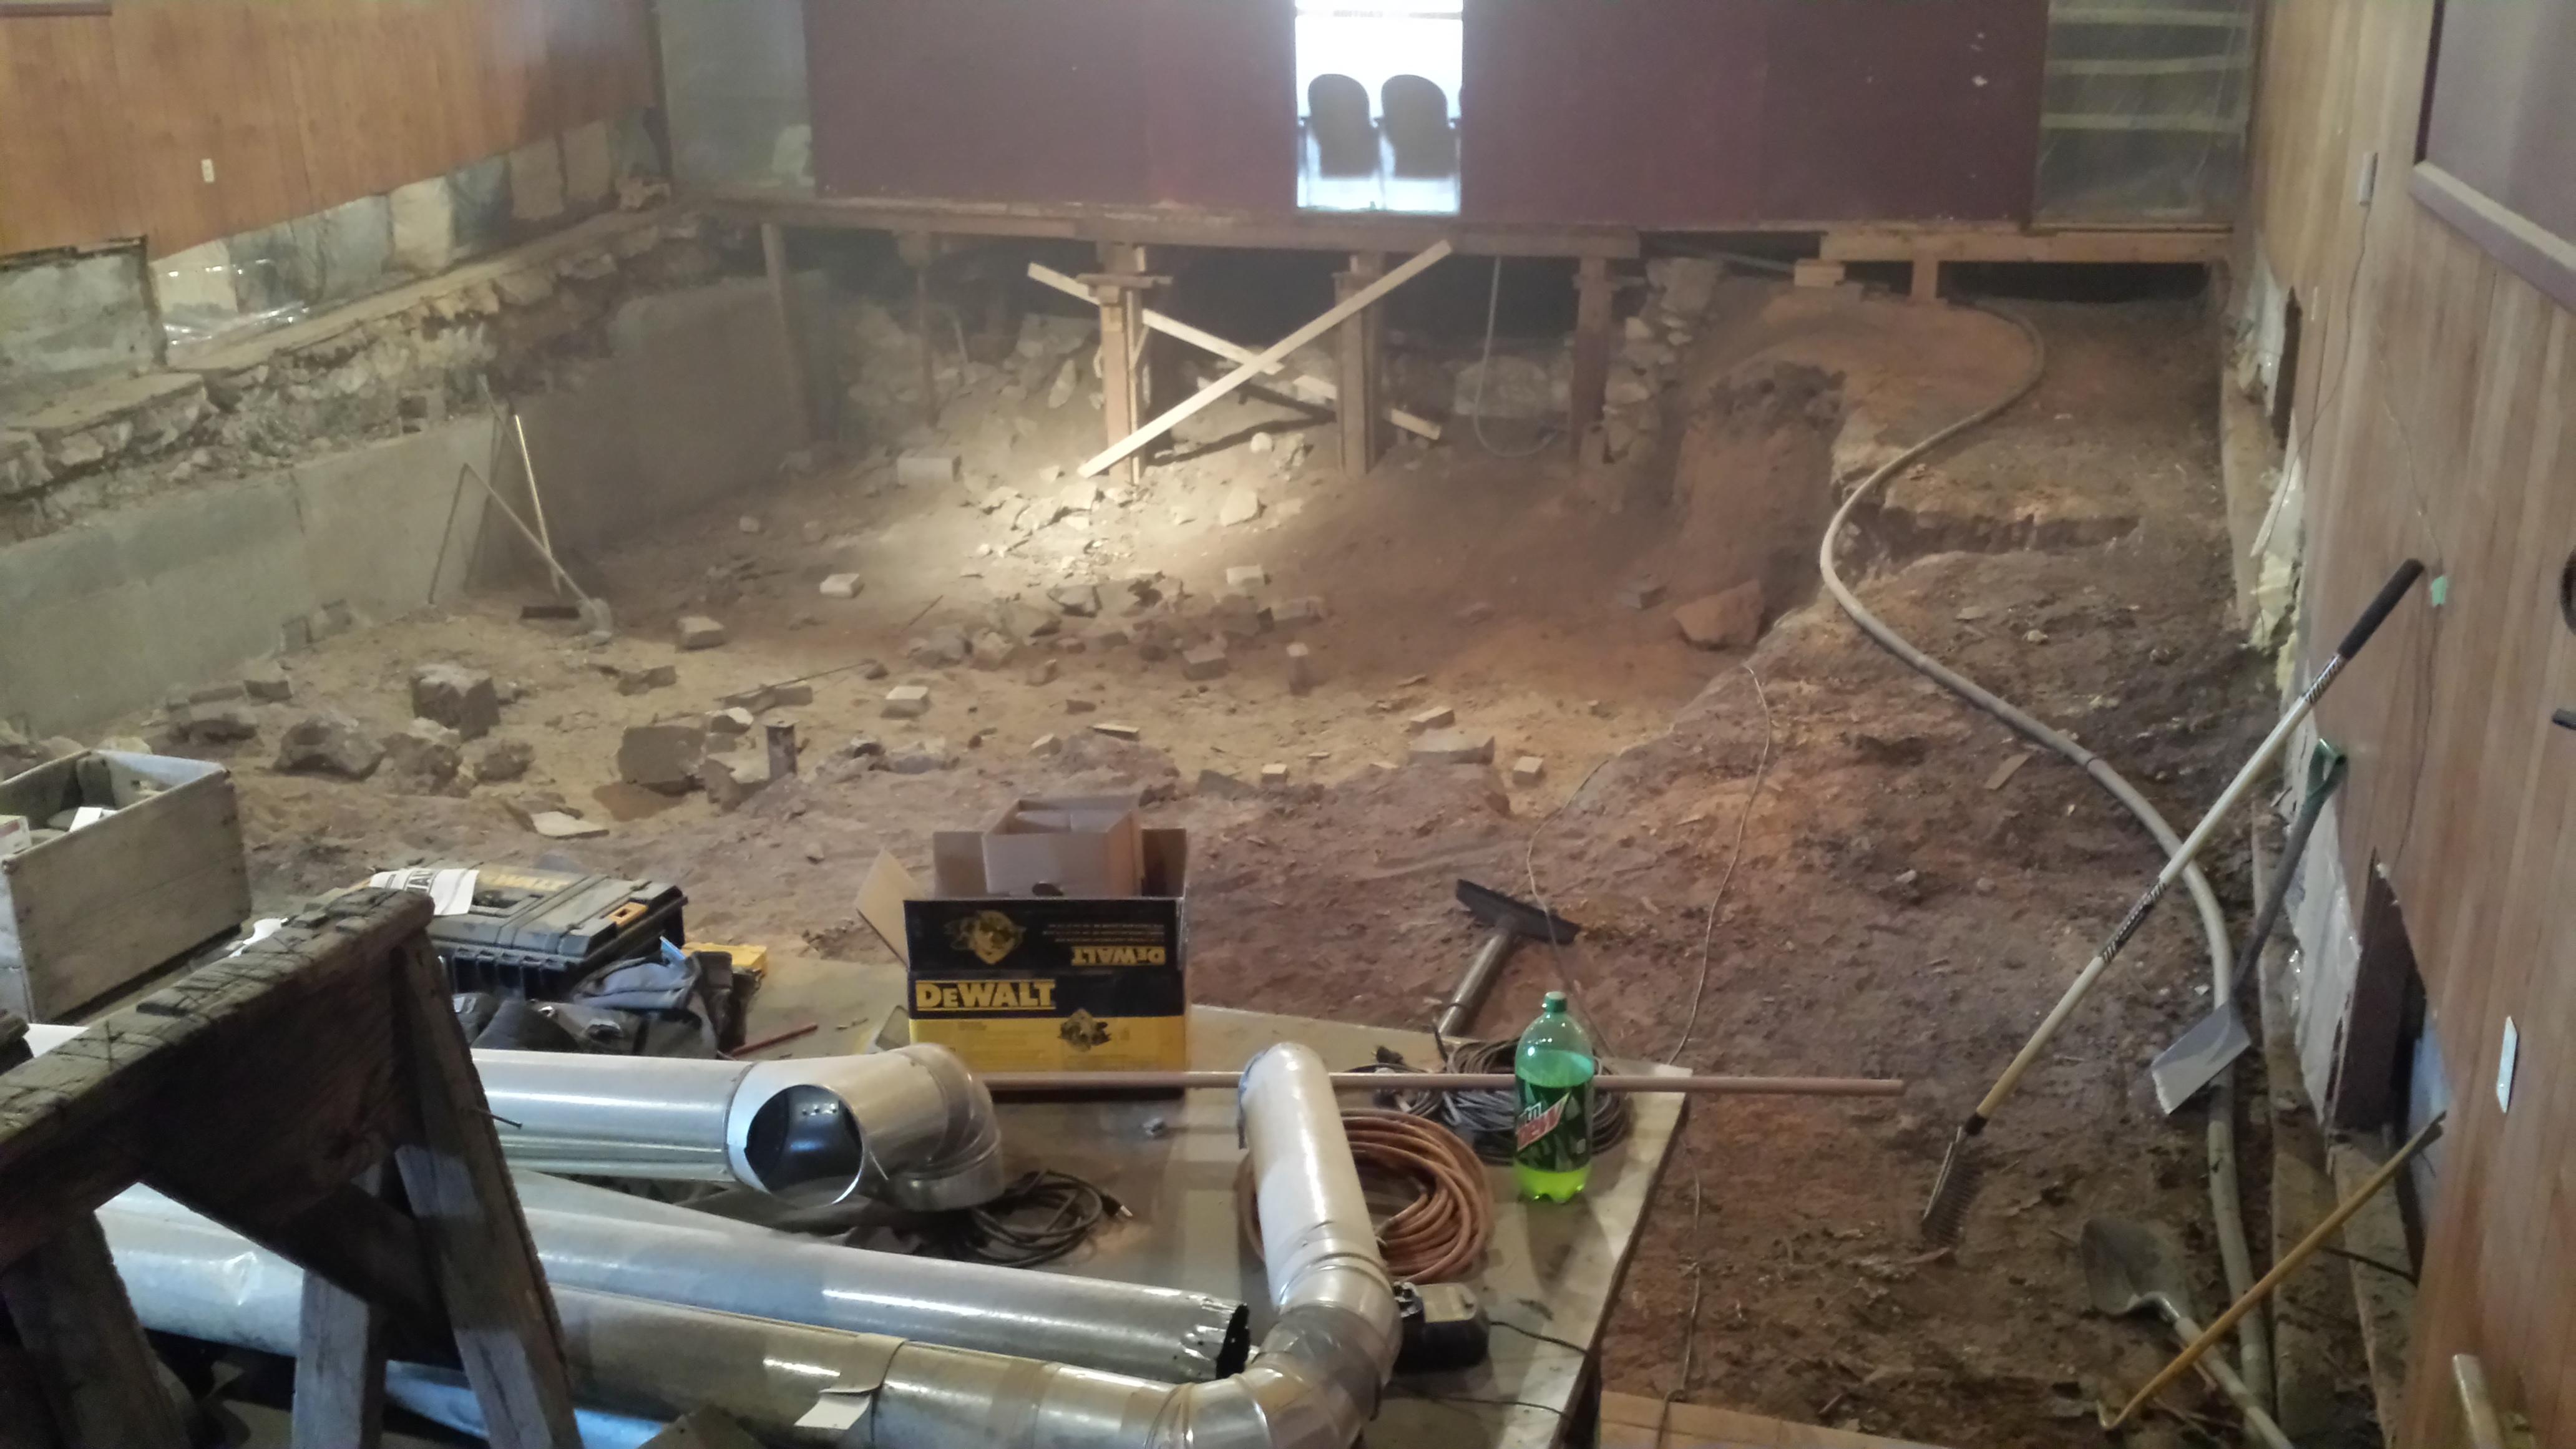 Historic Jones Theater, Westcliffe, Colorado, undergoes major renovation